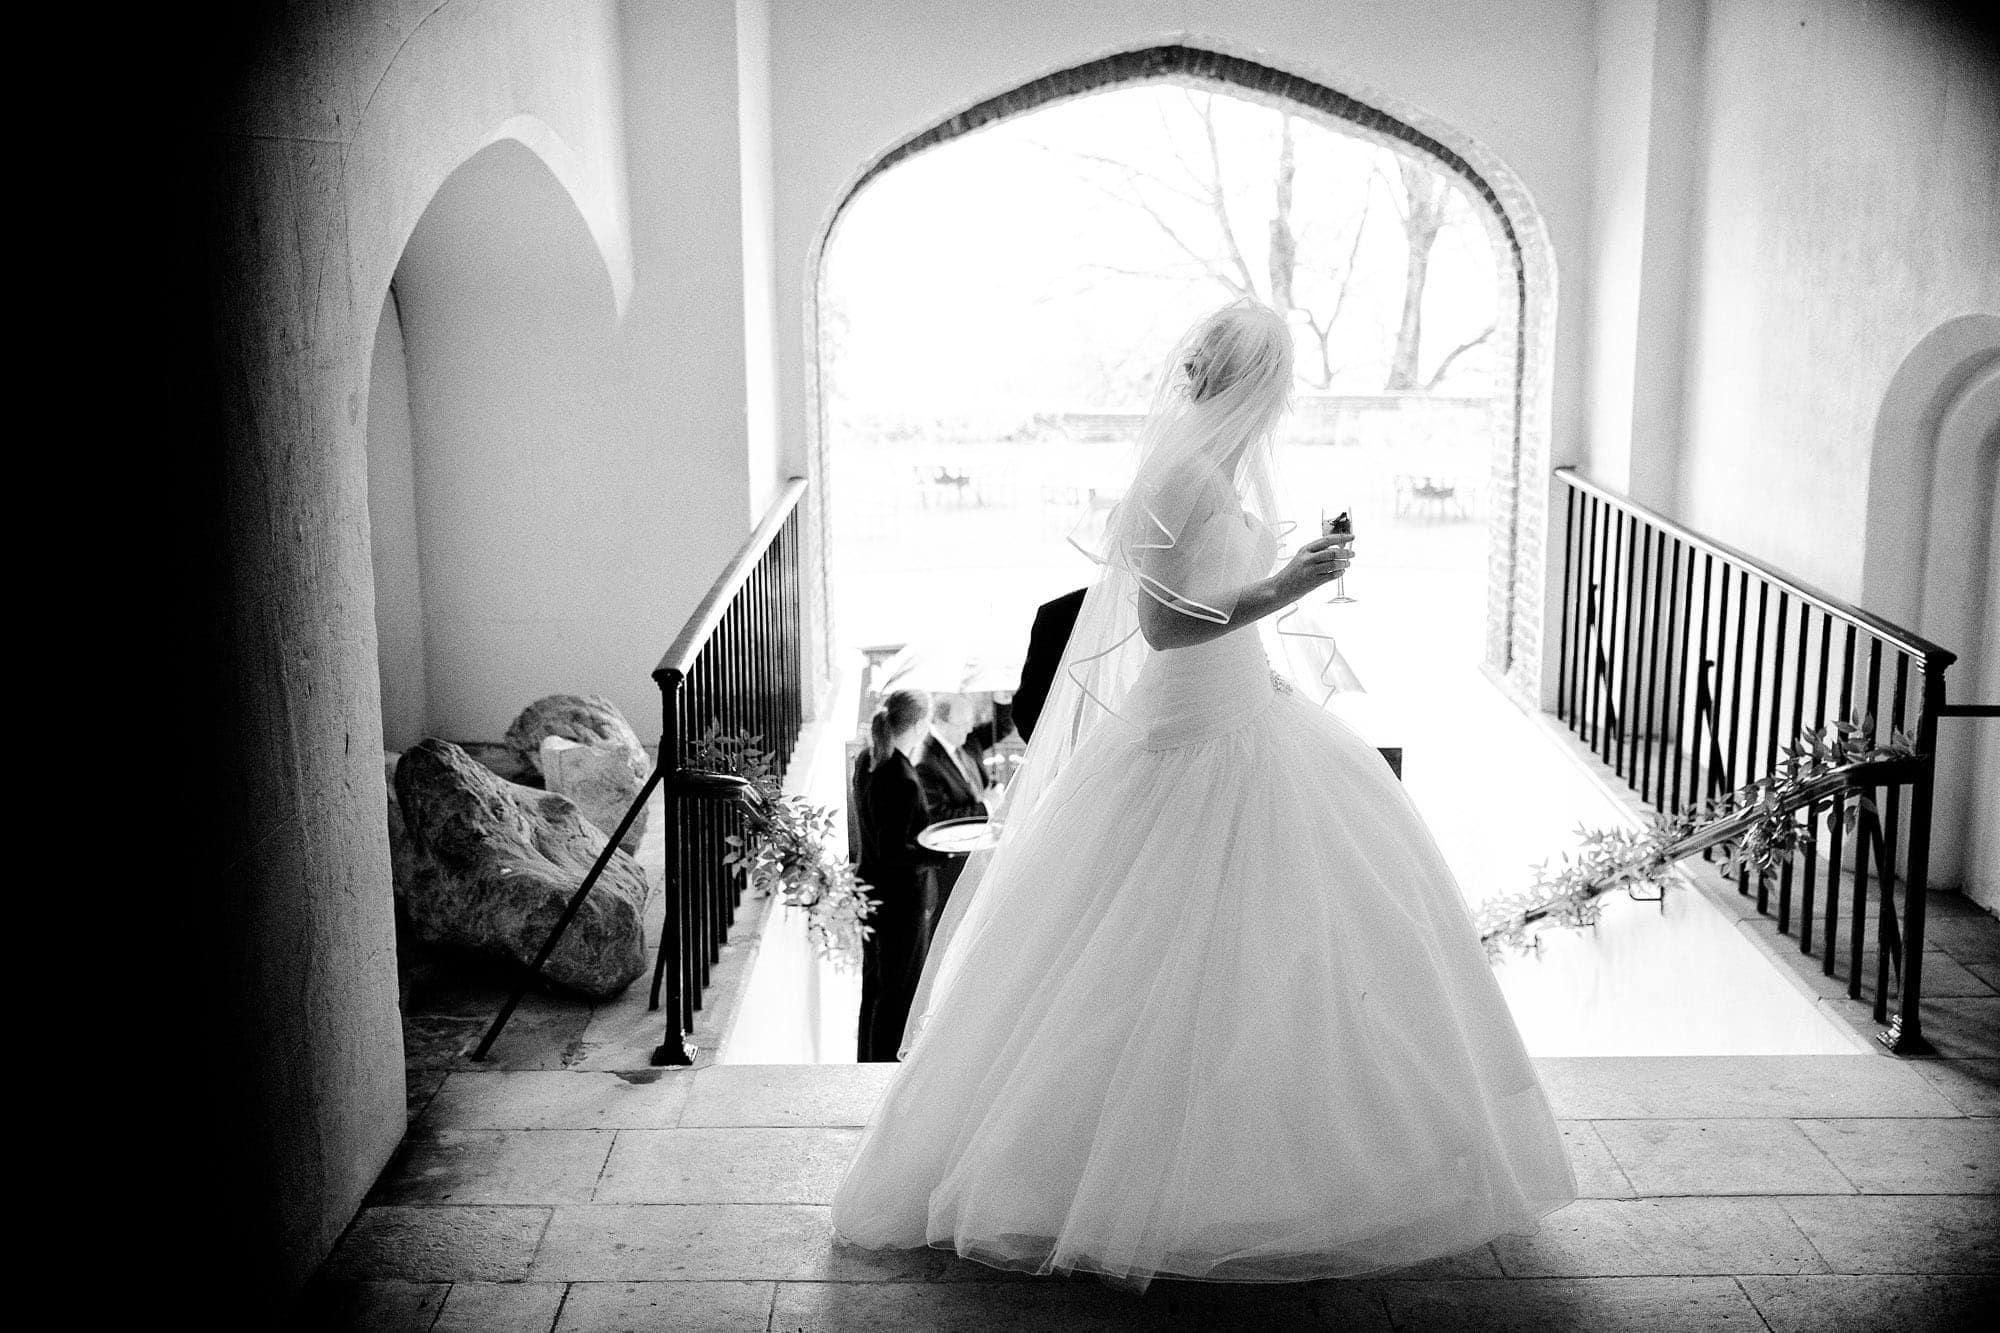 Farnham Castle Wedding Photography - Bride in the Archway at Farnham Castle